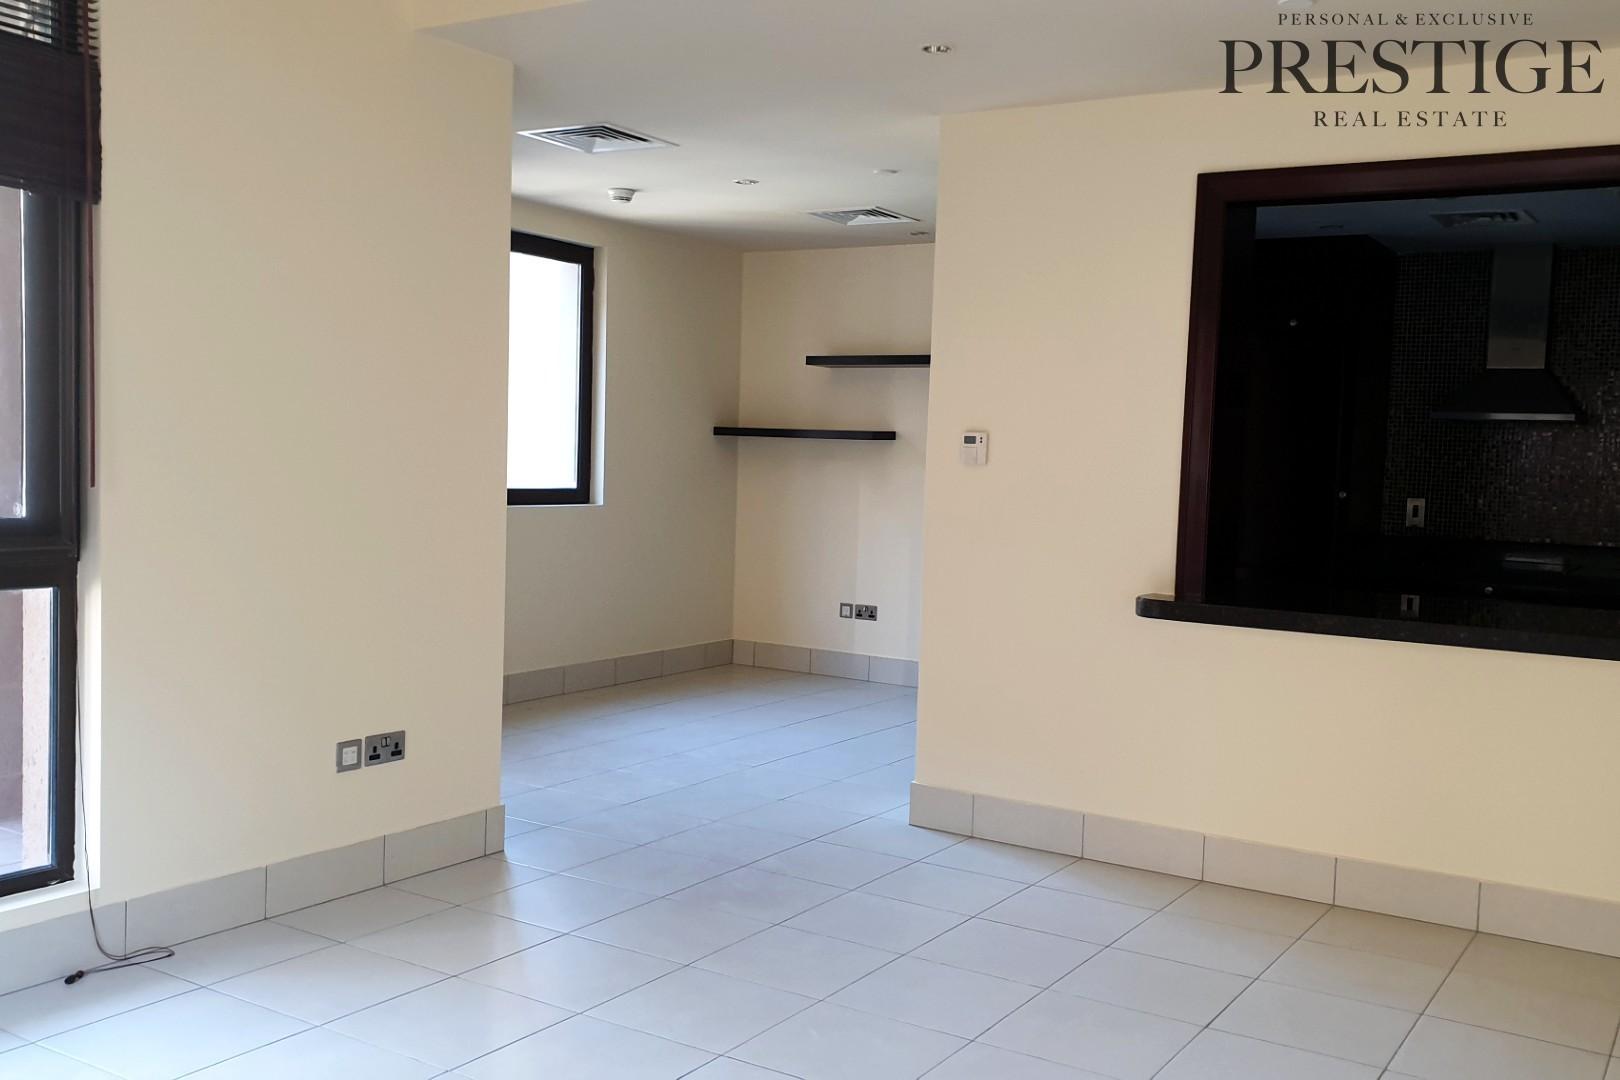 spacious-2-bedroom-with-study-pool-views